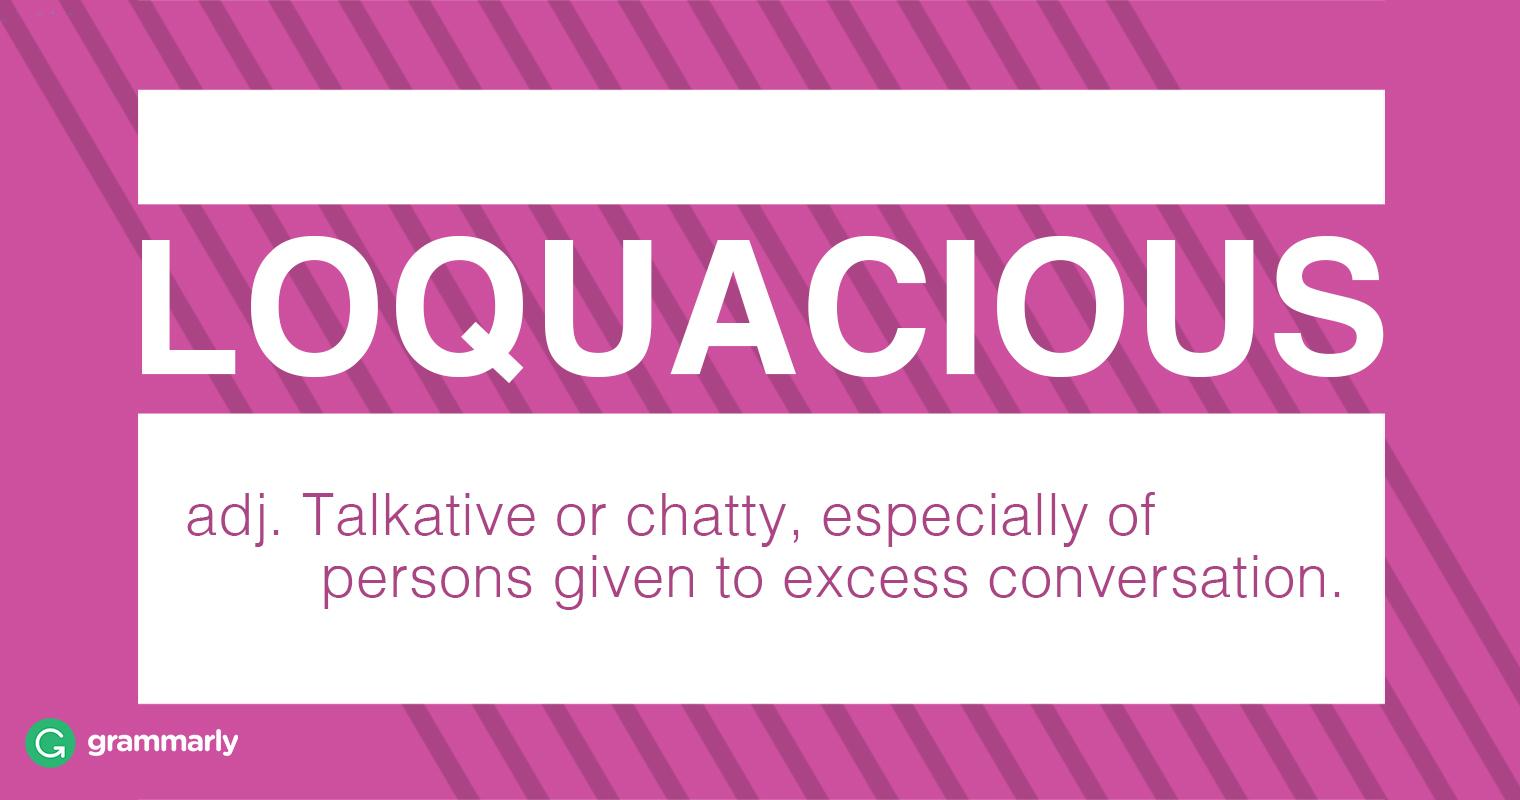 What does loquacious mean